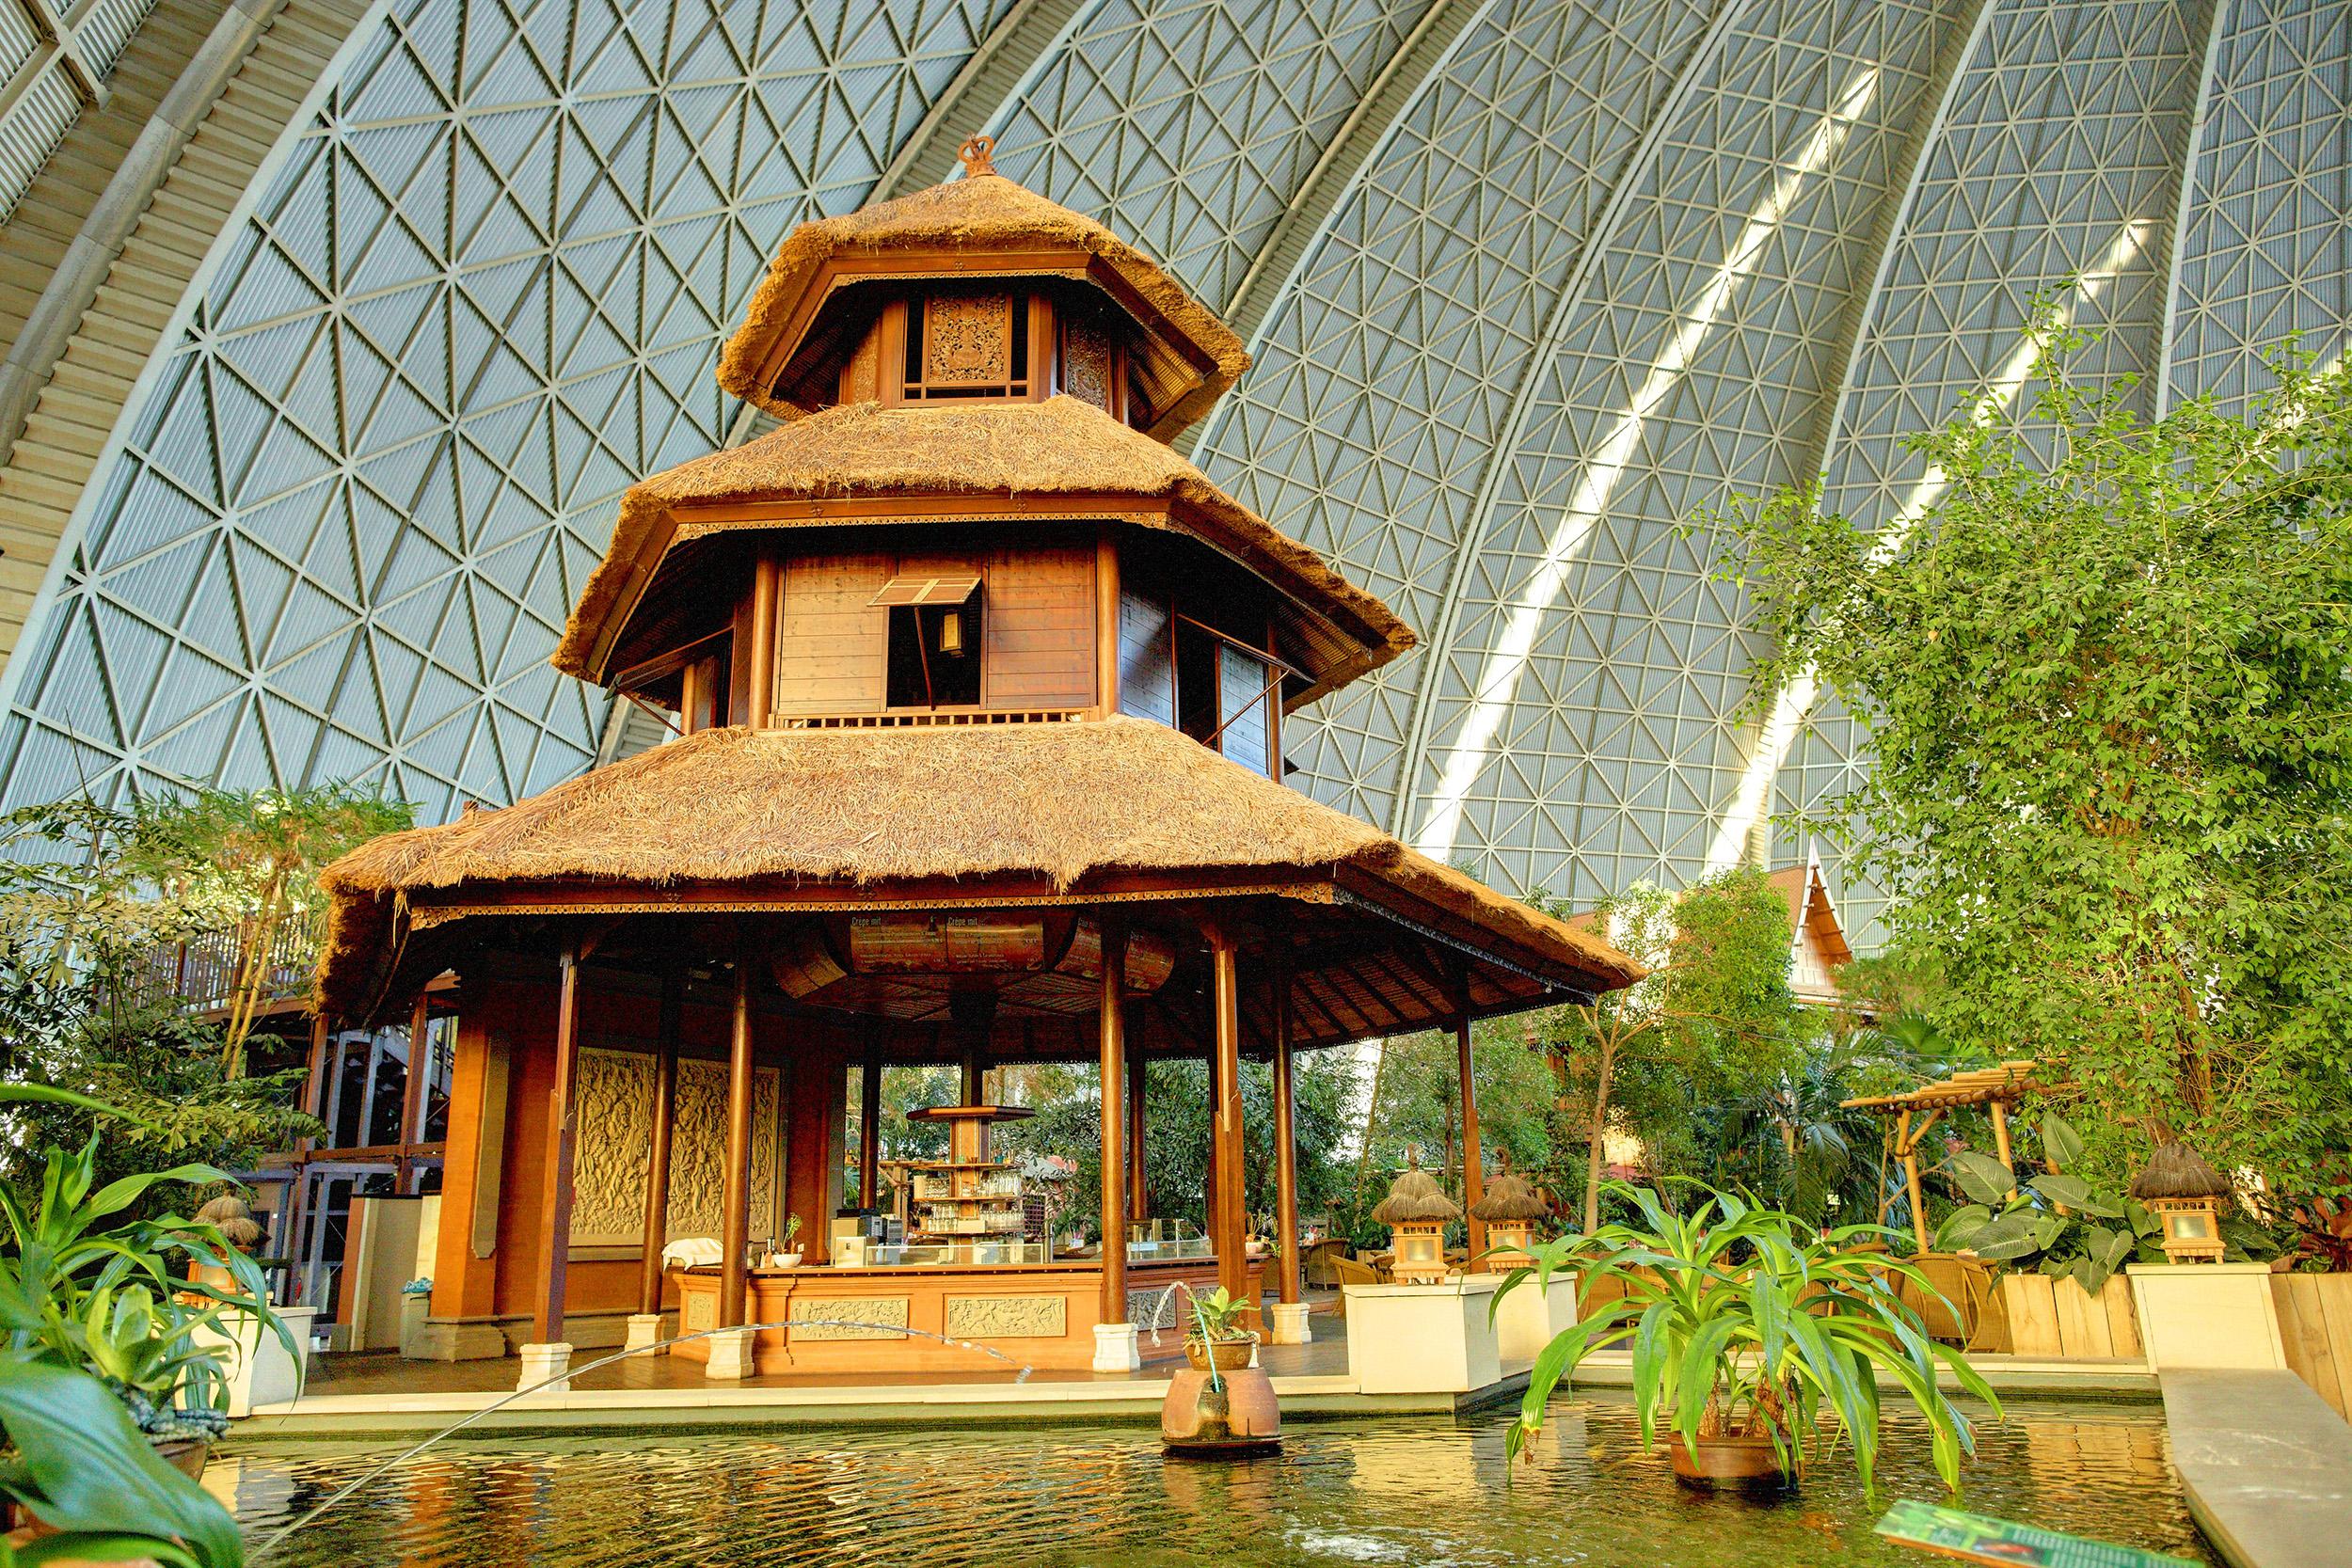 Tropical Island Sauna Kleiderordnung